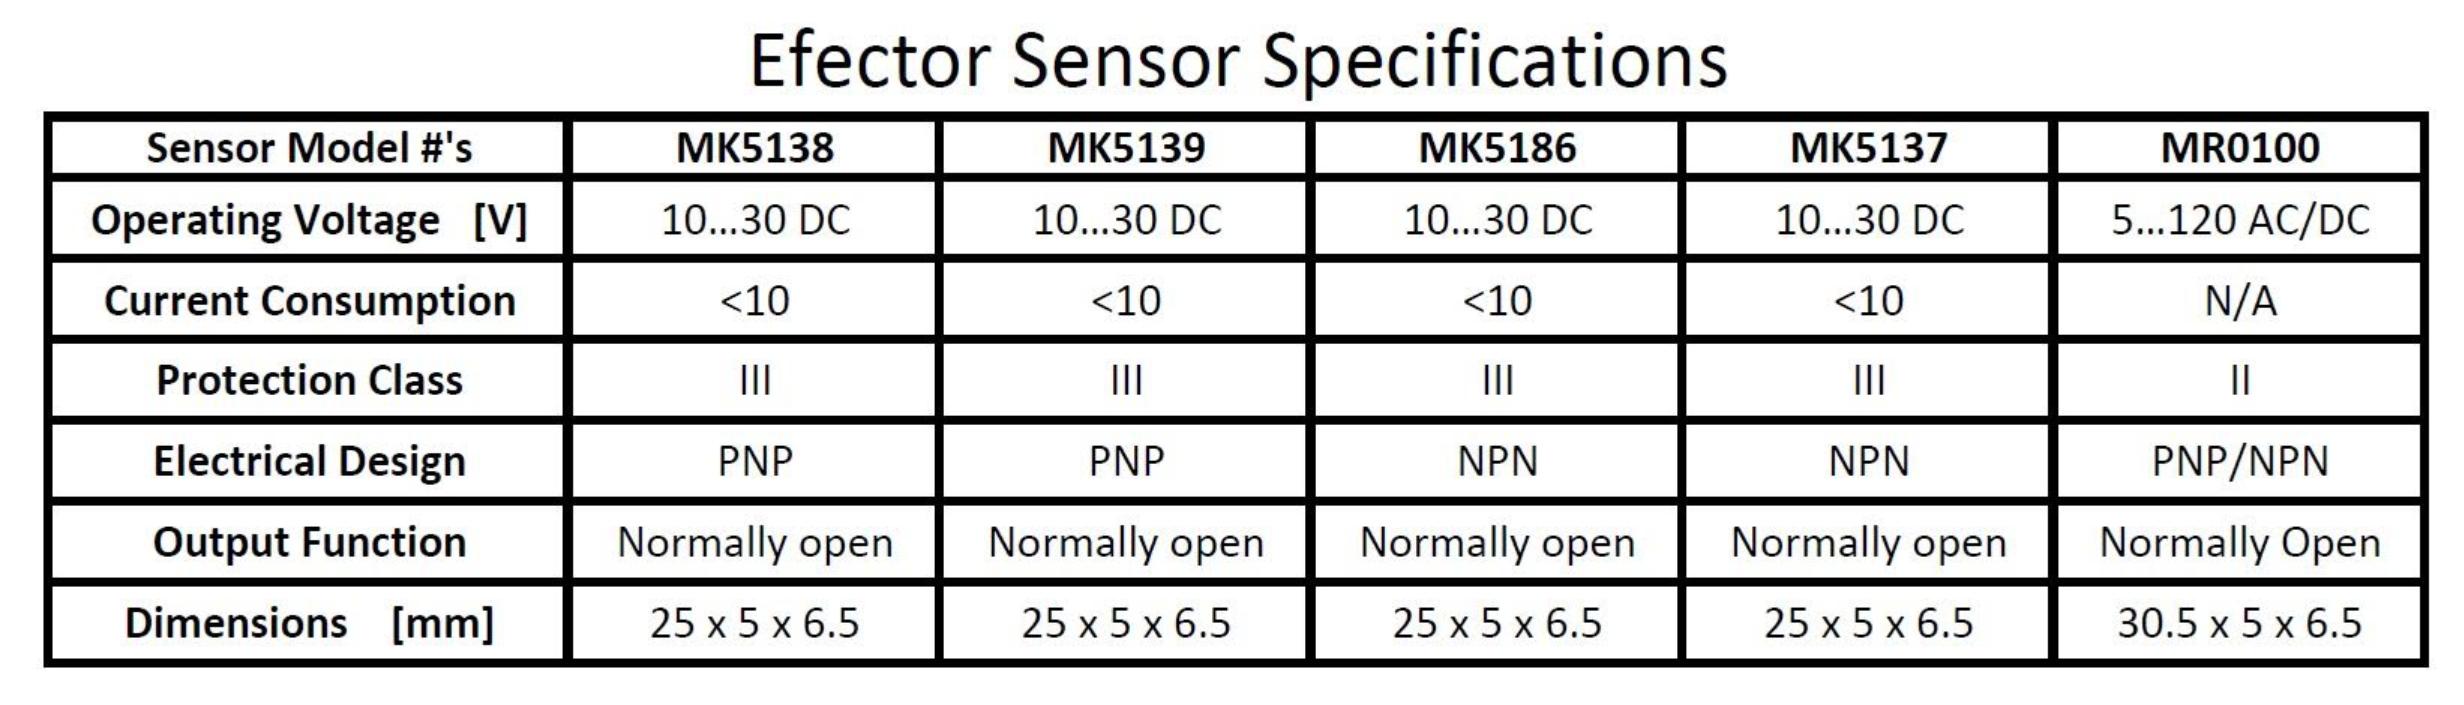 Efector Sensor Specifications